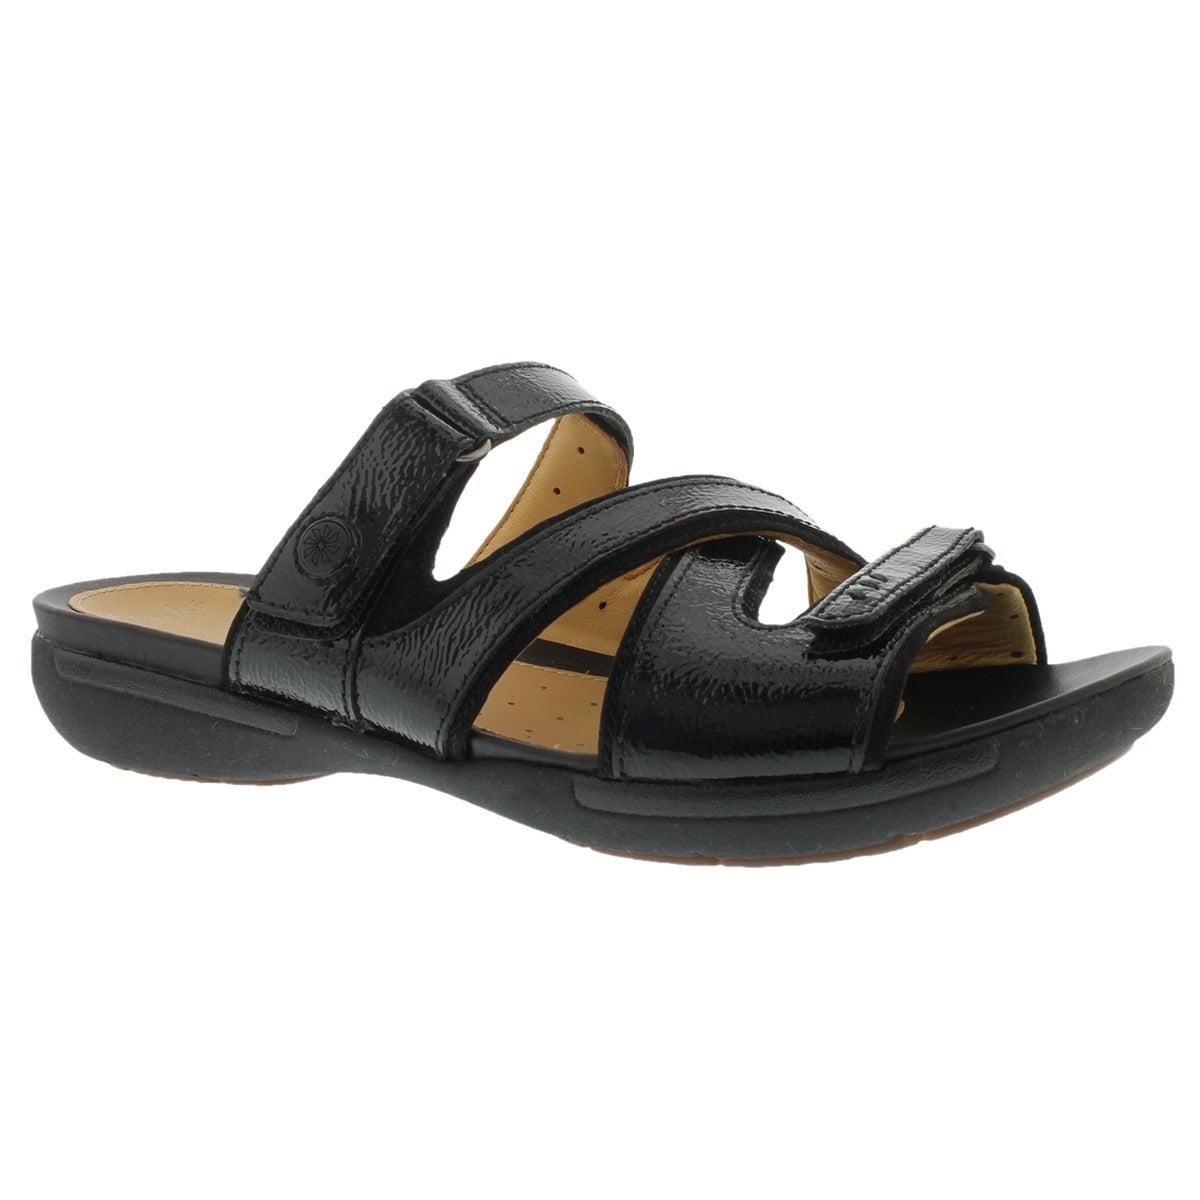 Lds Un.Verlee black casual slide sandal